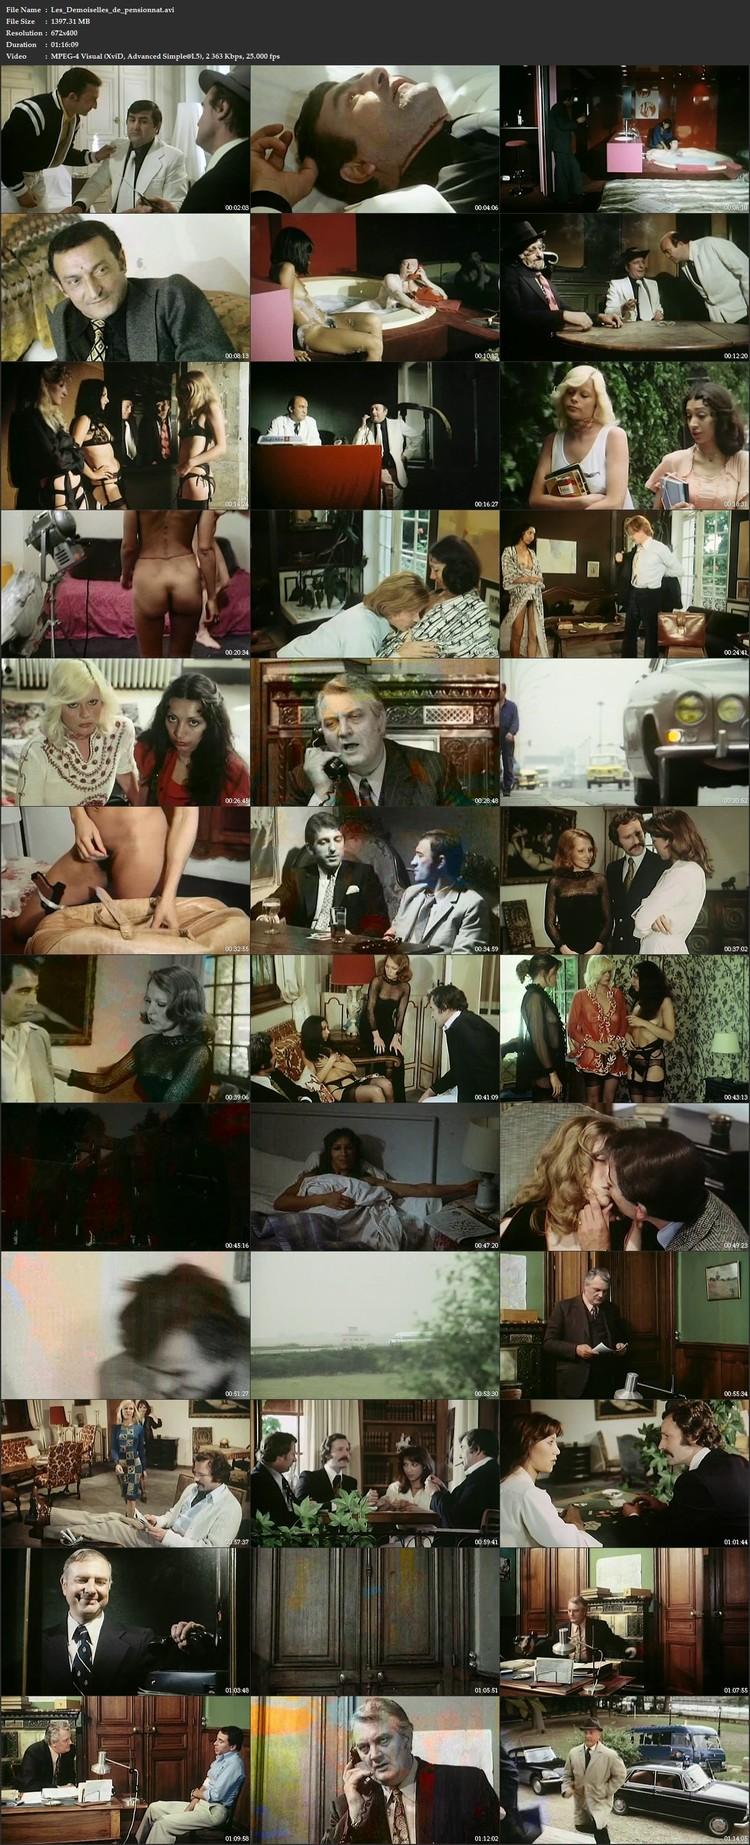 http://ist3-6.filesor.com/pimpandhost.com/1/_/_/_/1/4/i/t/j/4itj2/Les_Demoiselles_de_pensionnat.avi_l.jpg